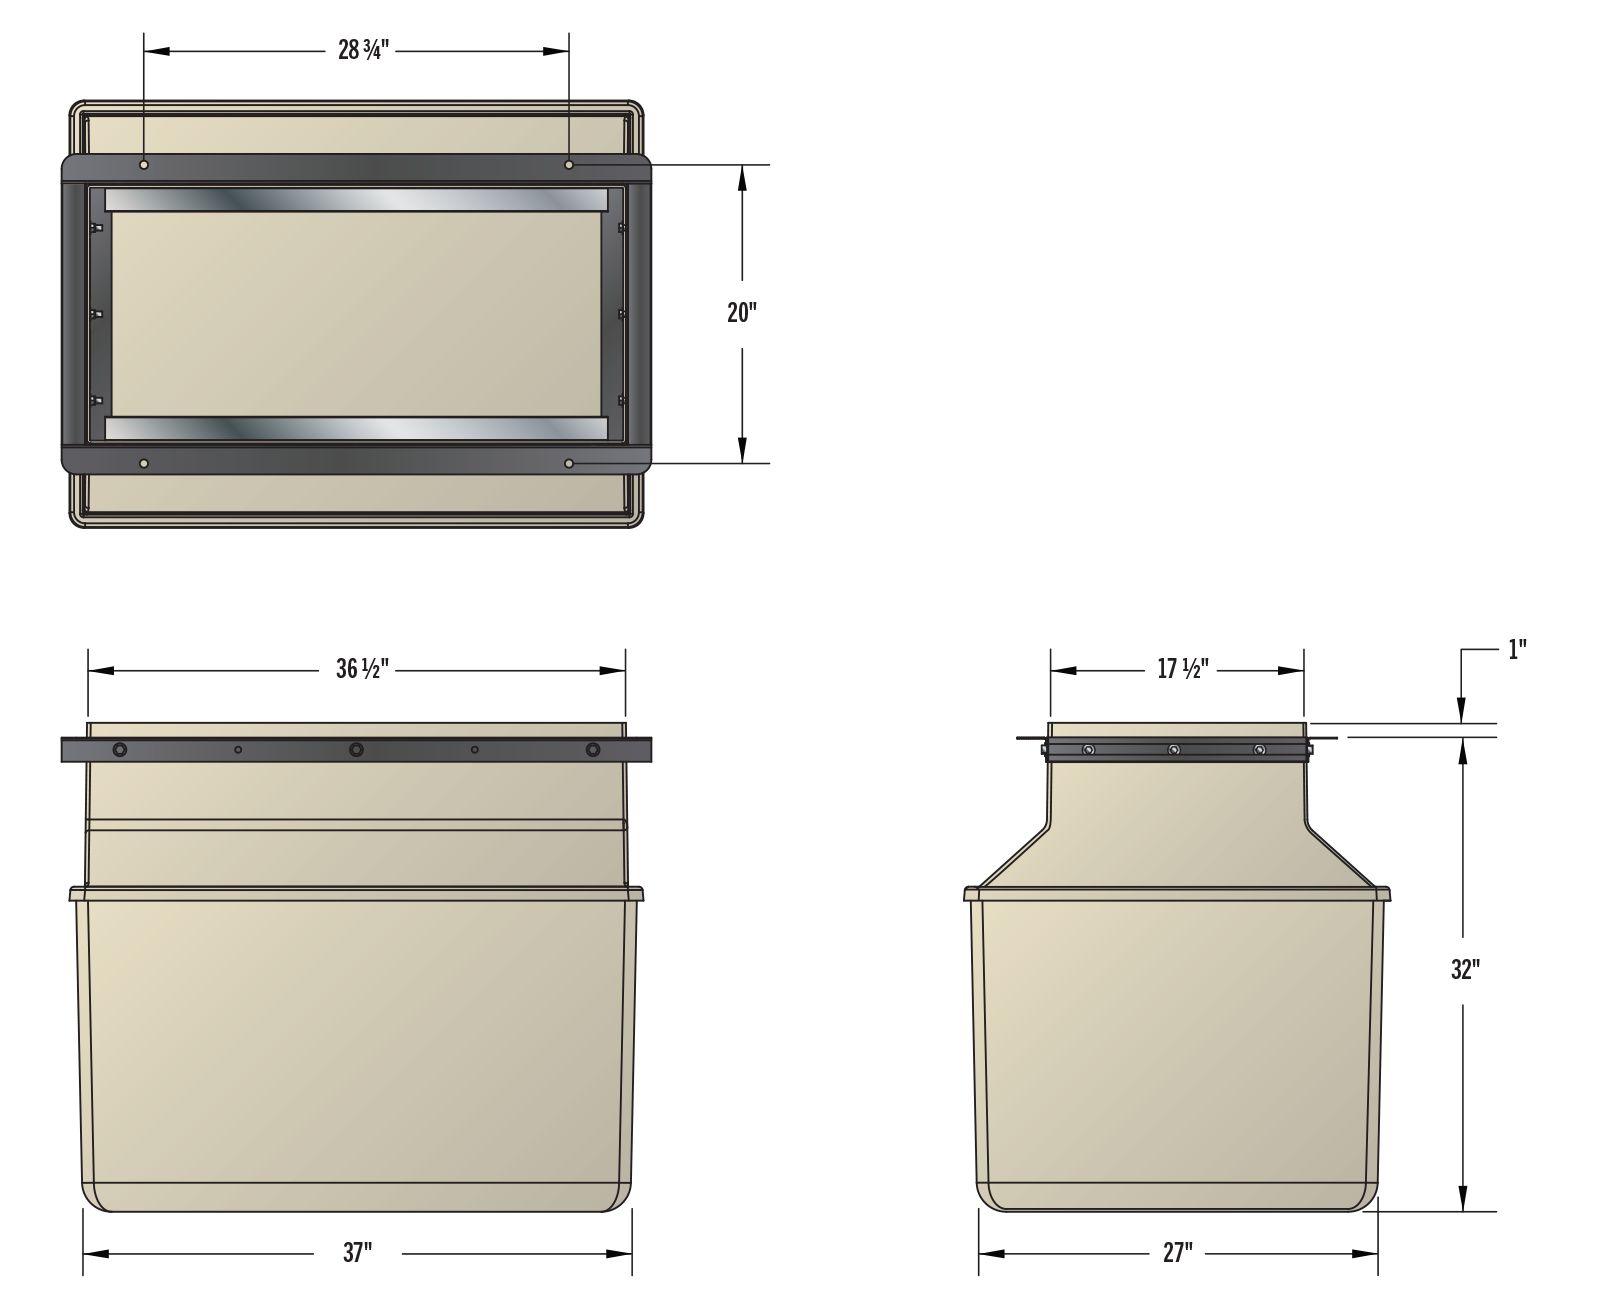 Low Profile Dispenser Sump - Dims.psd